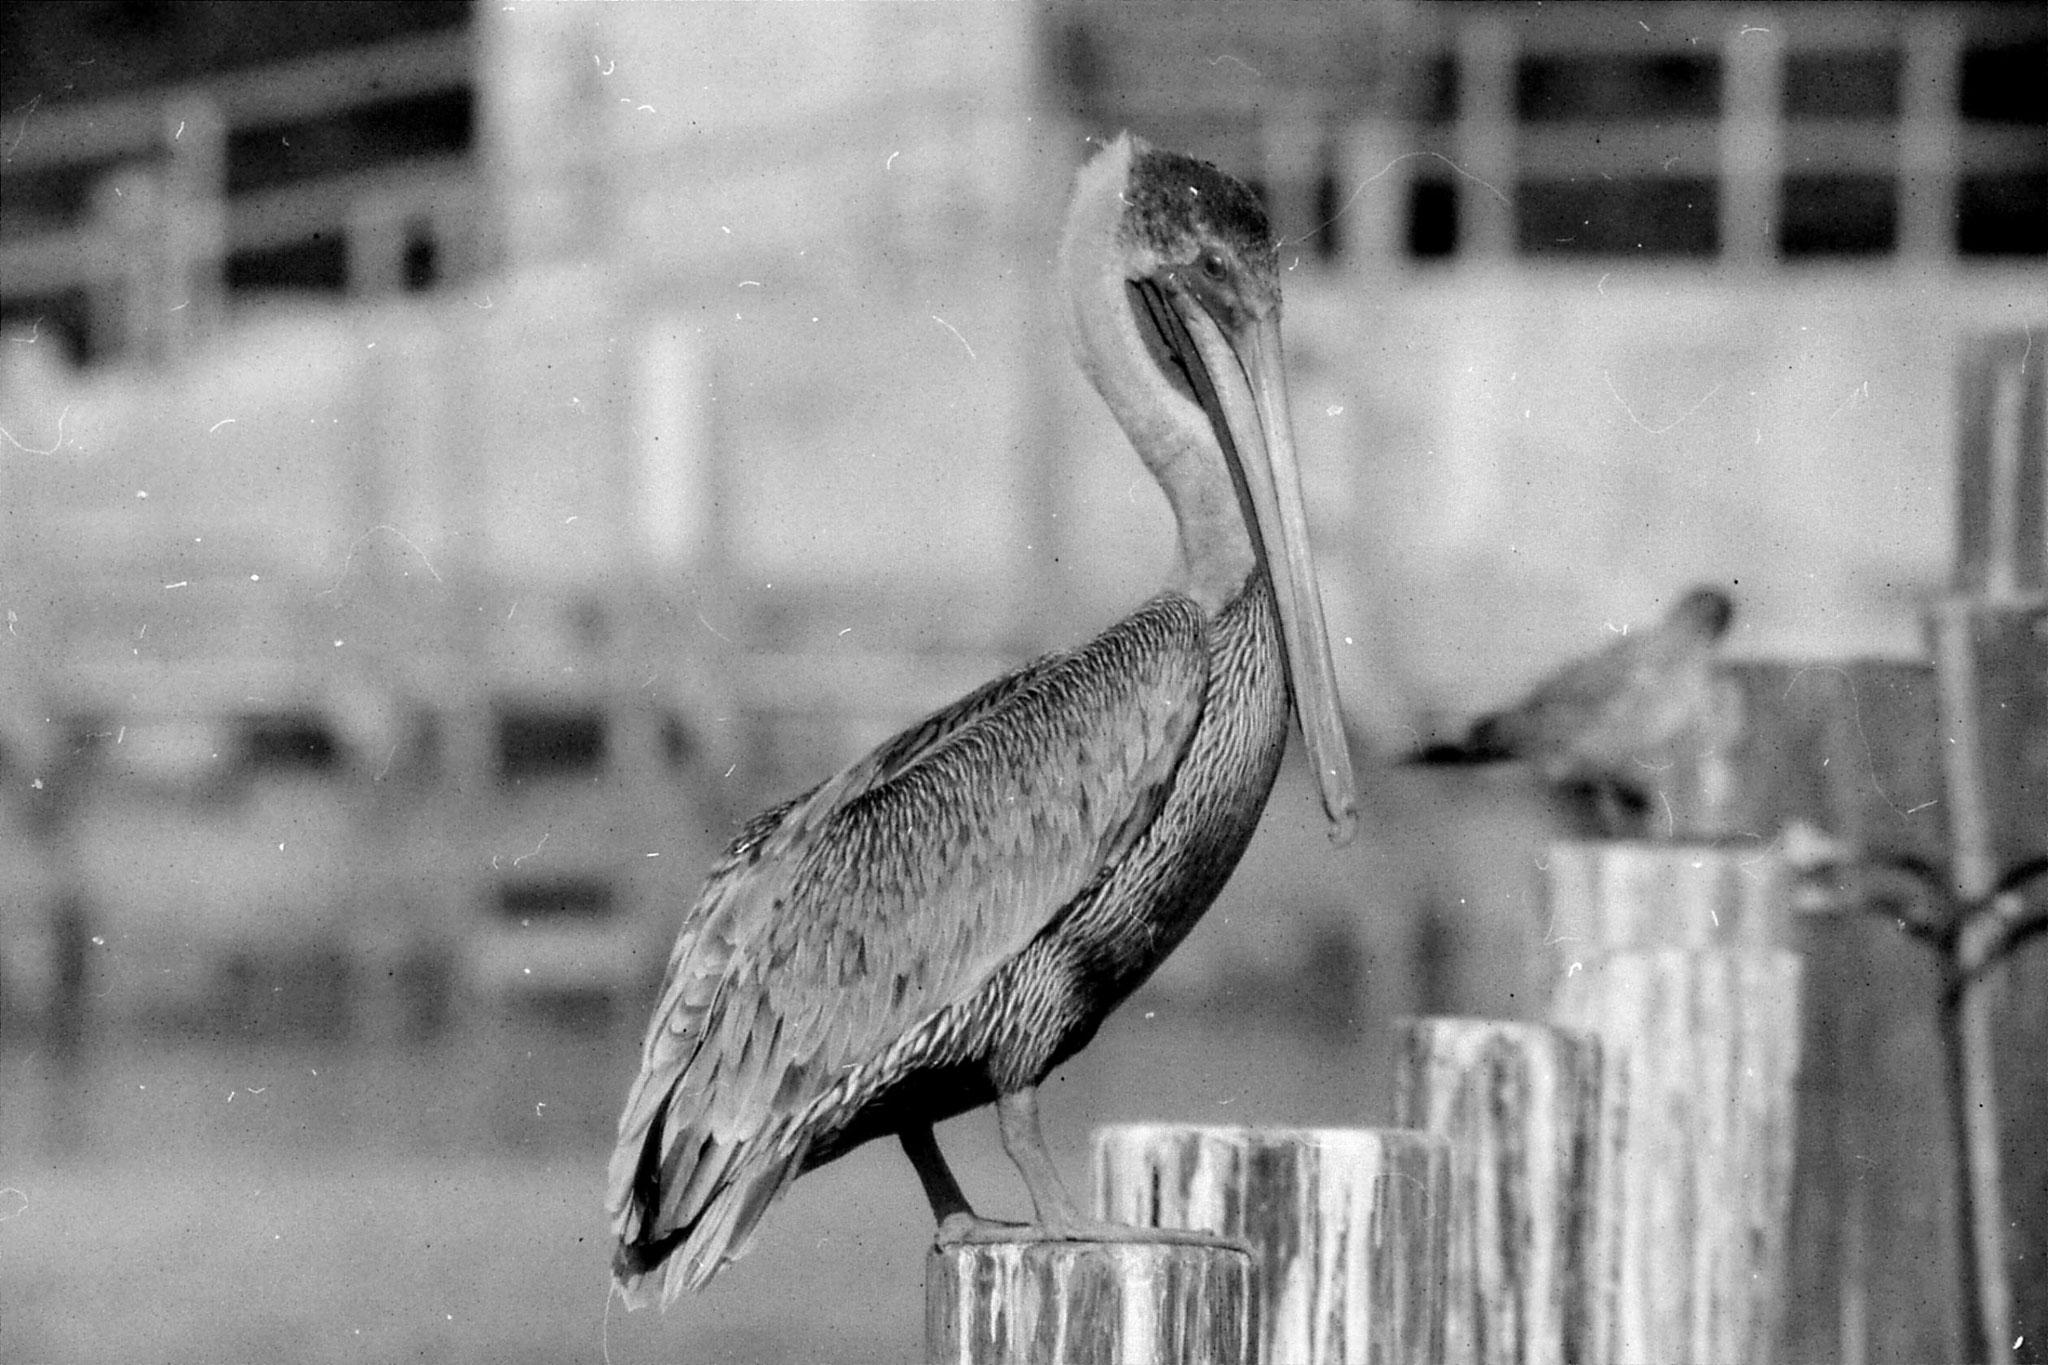 21/12/1990: 12: Everglades